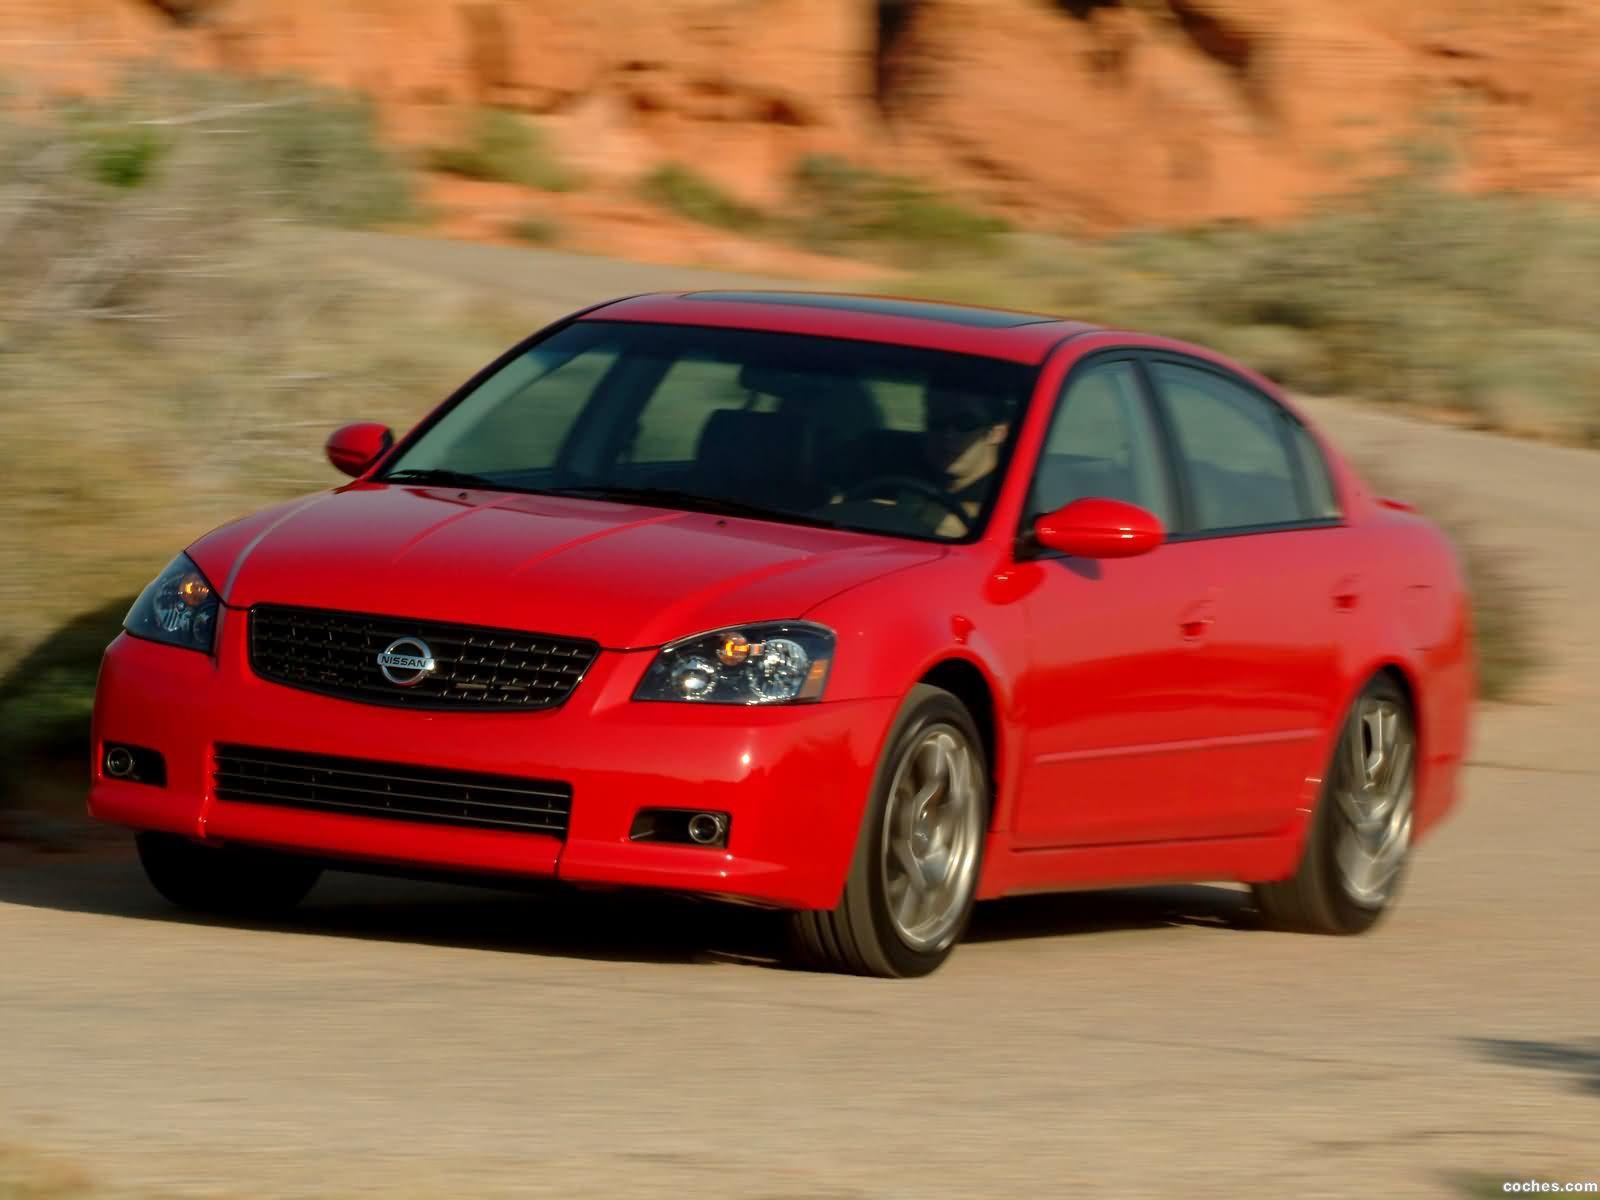 Foto 6 de Nissan Altima SE-R 2005